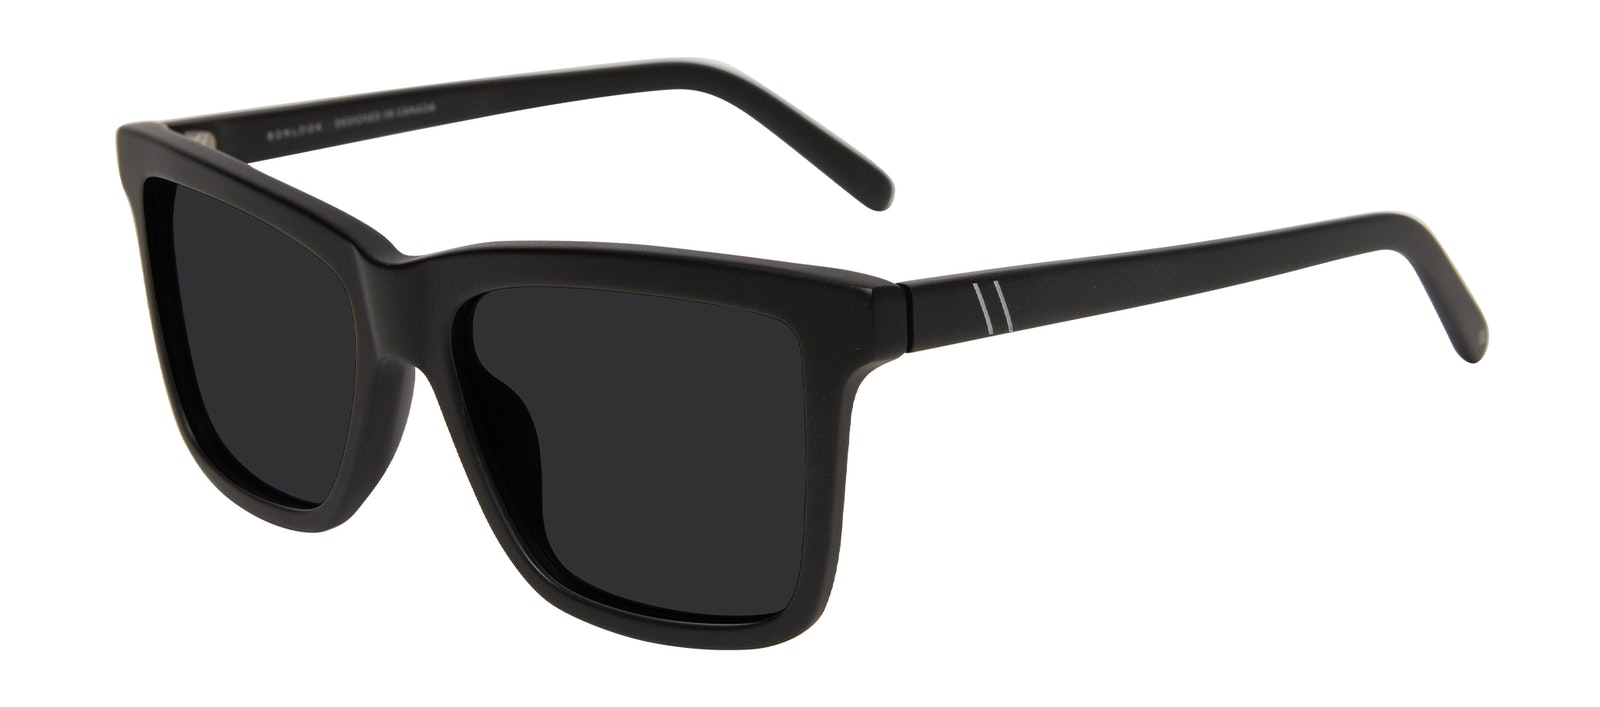 Affordable Fashion Glasses Square Sunglasses Men Elite Matte Black Tilt